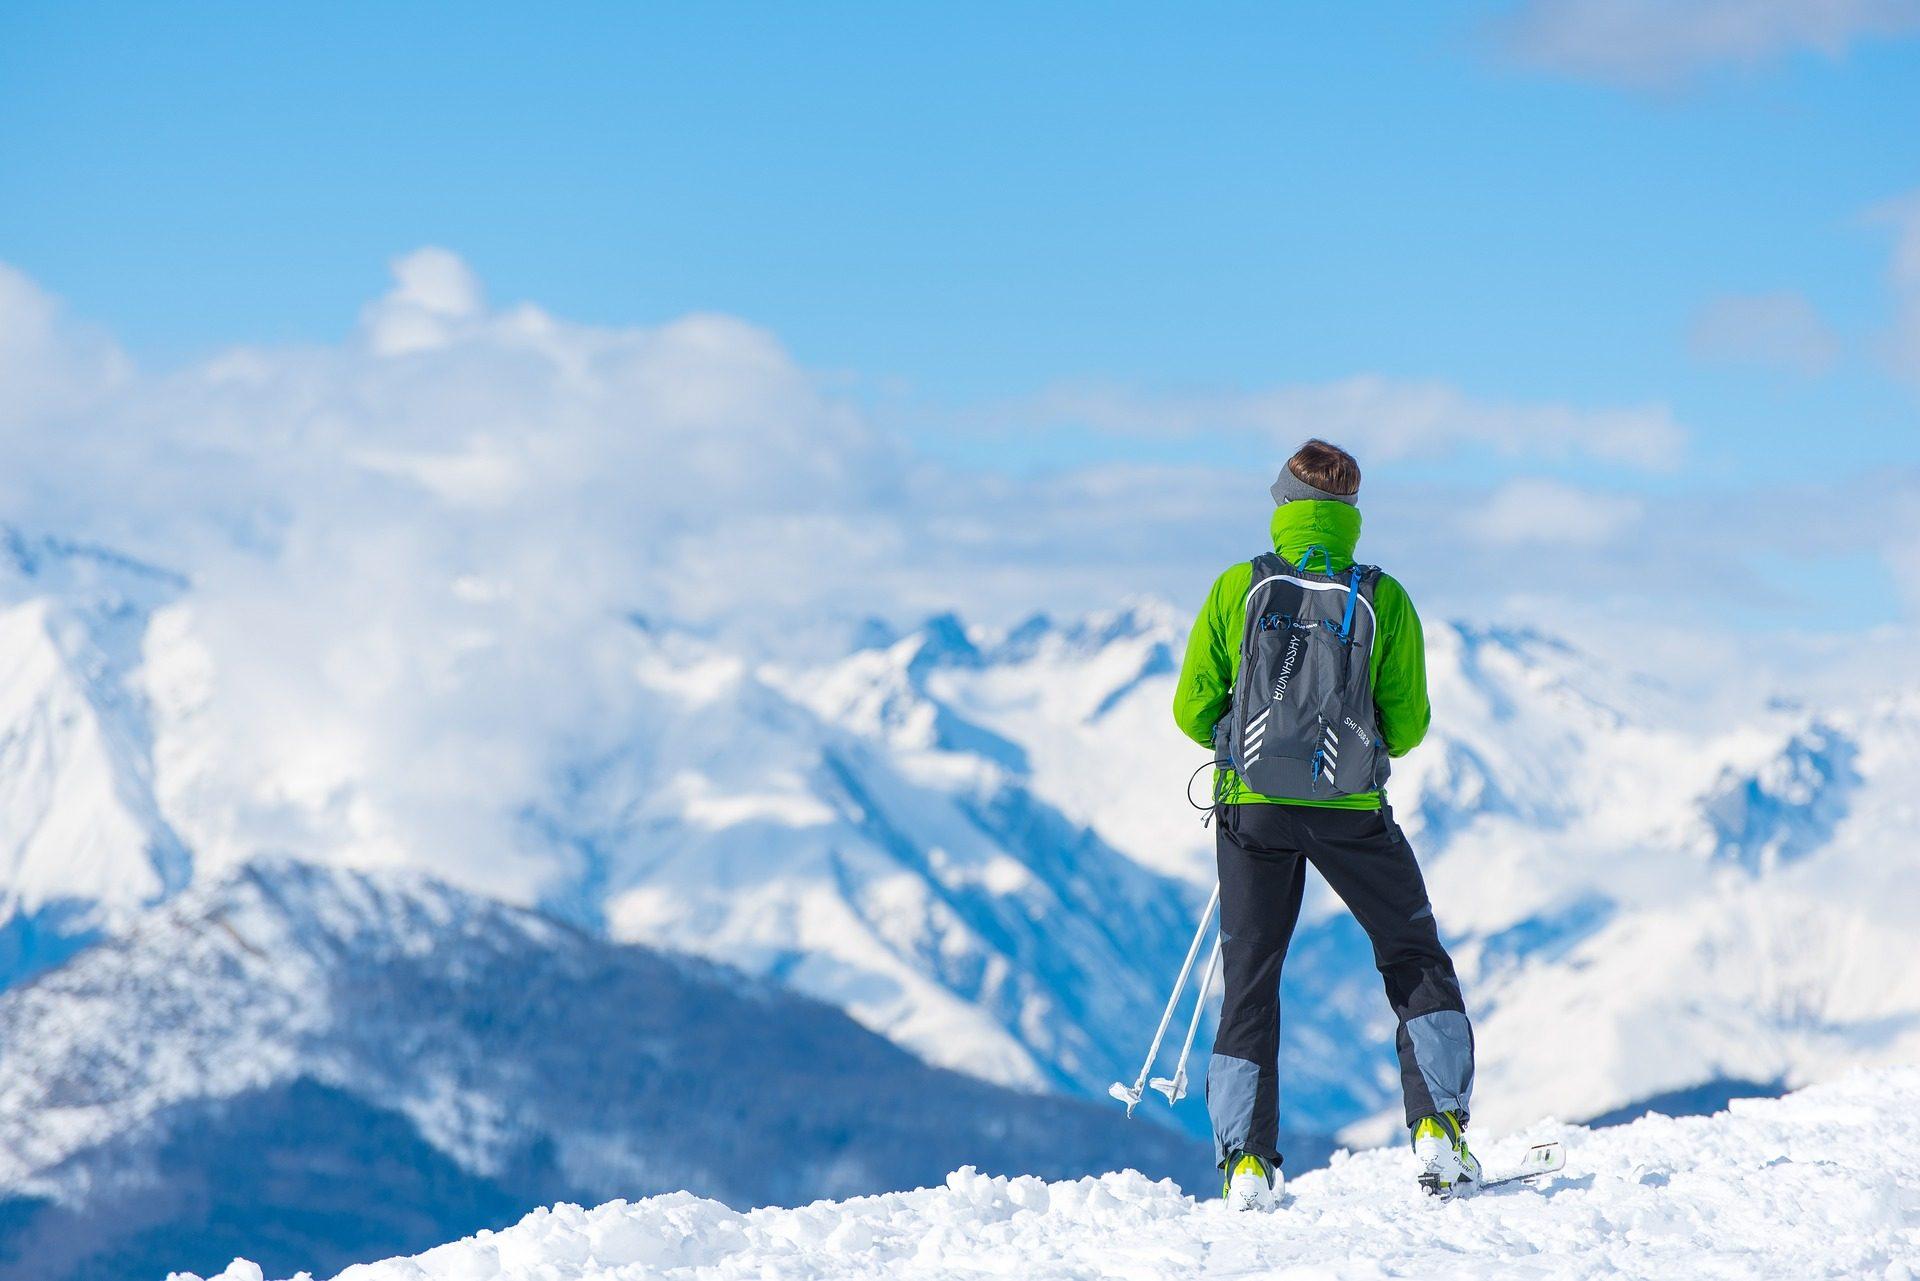 montañero, esquiador, montaña, nieve, aventura, cielo, nubes - Fondos de Pantalla HD - professor-falken.com